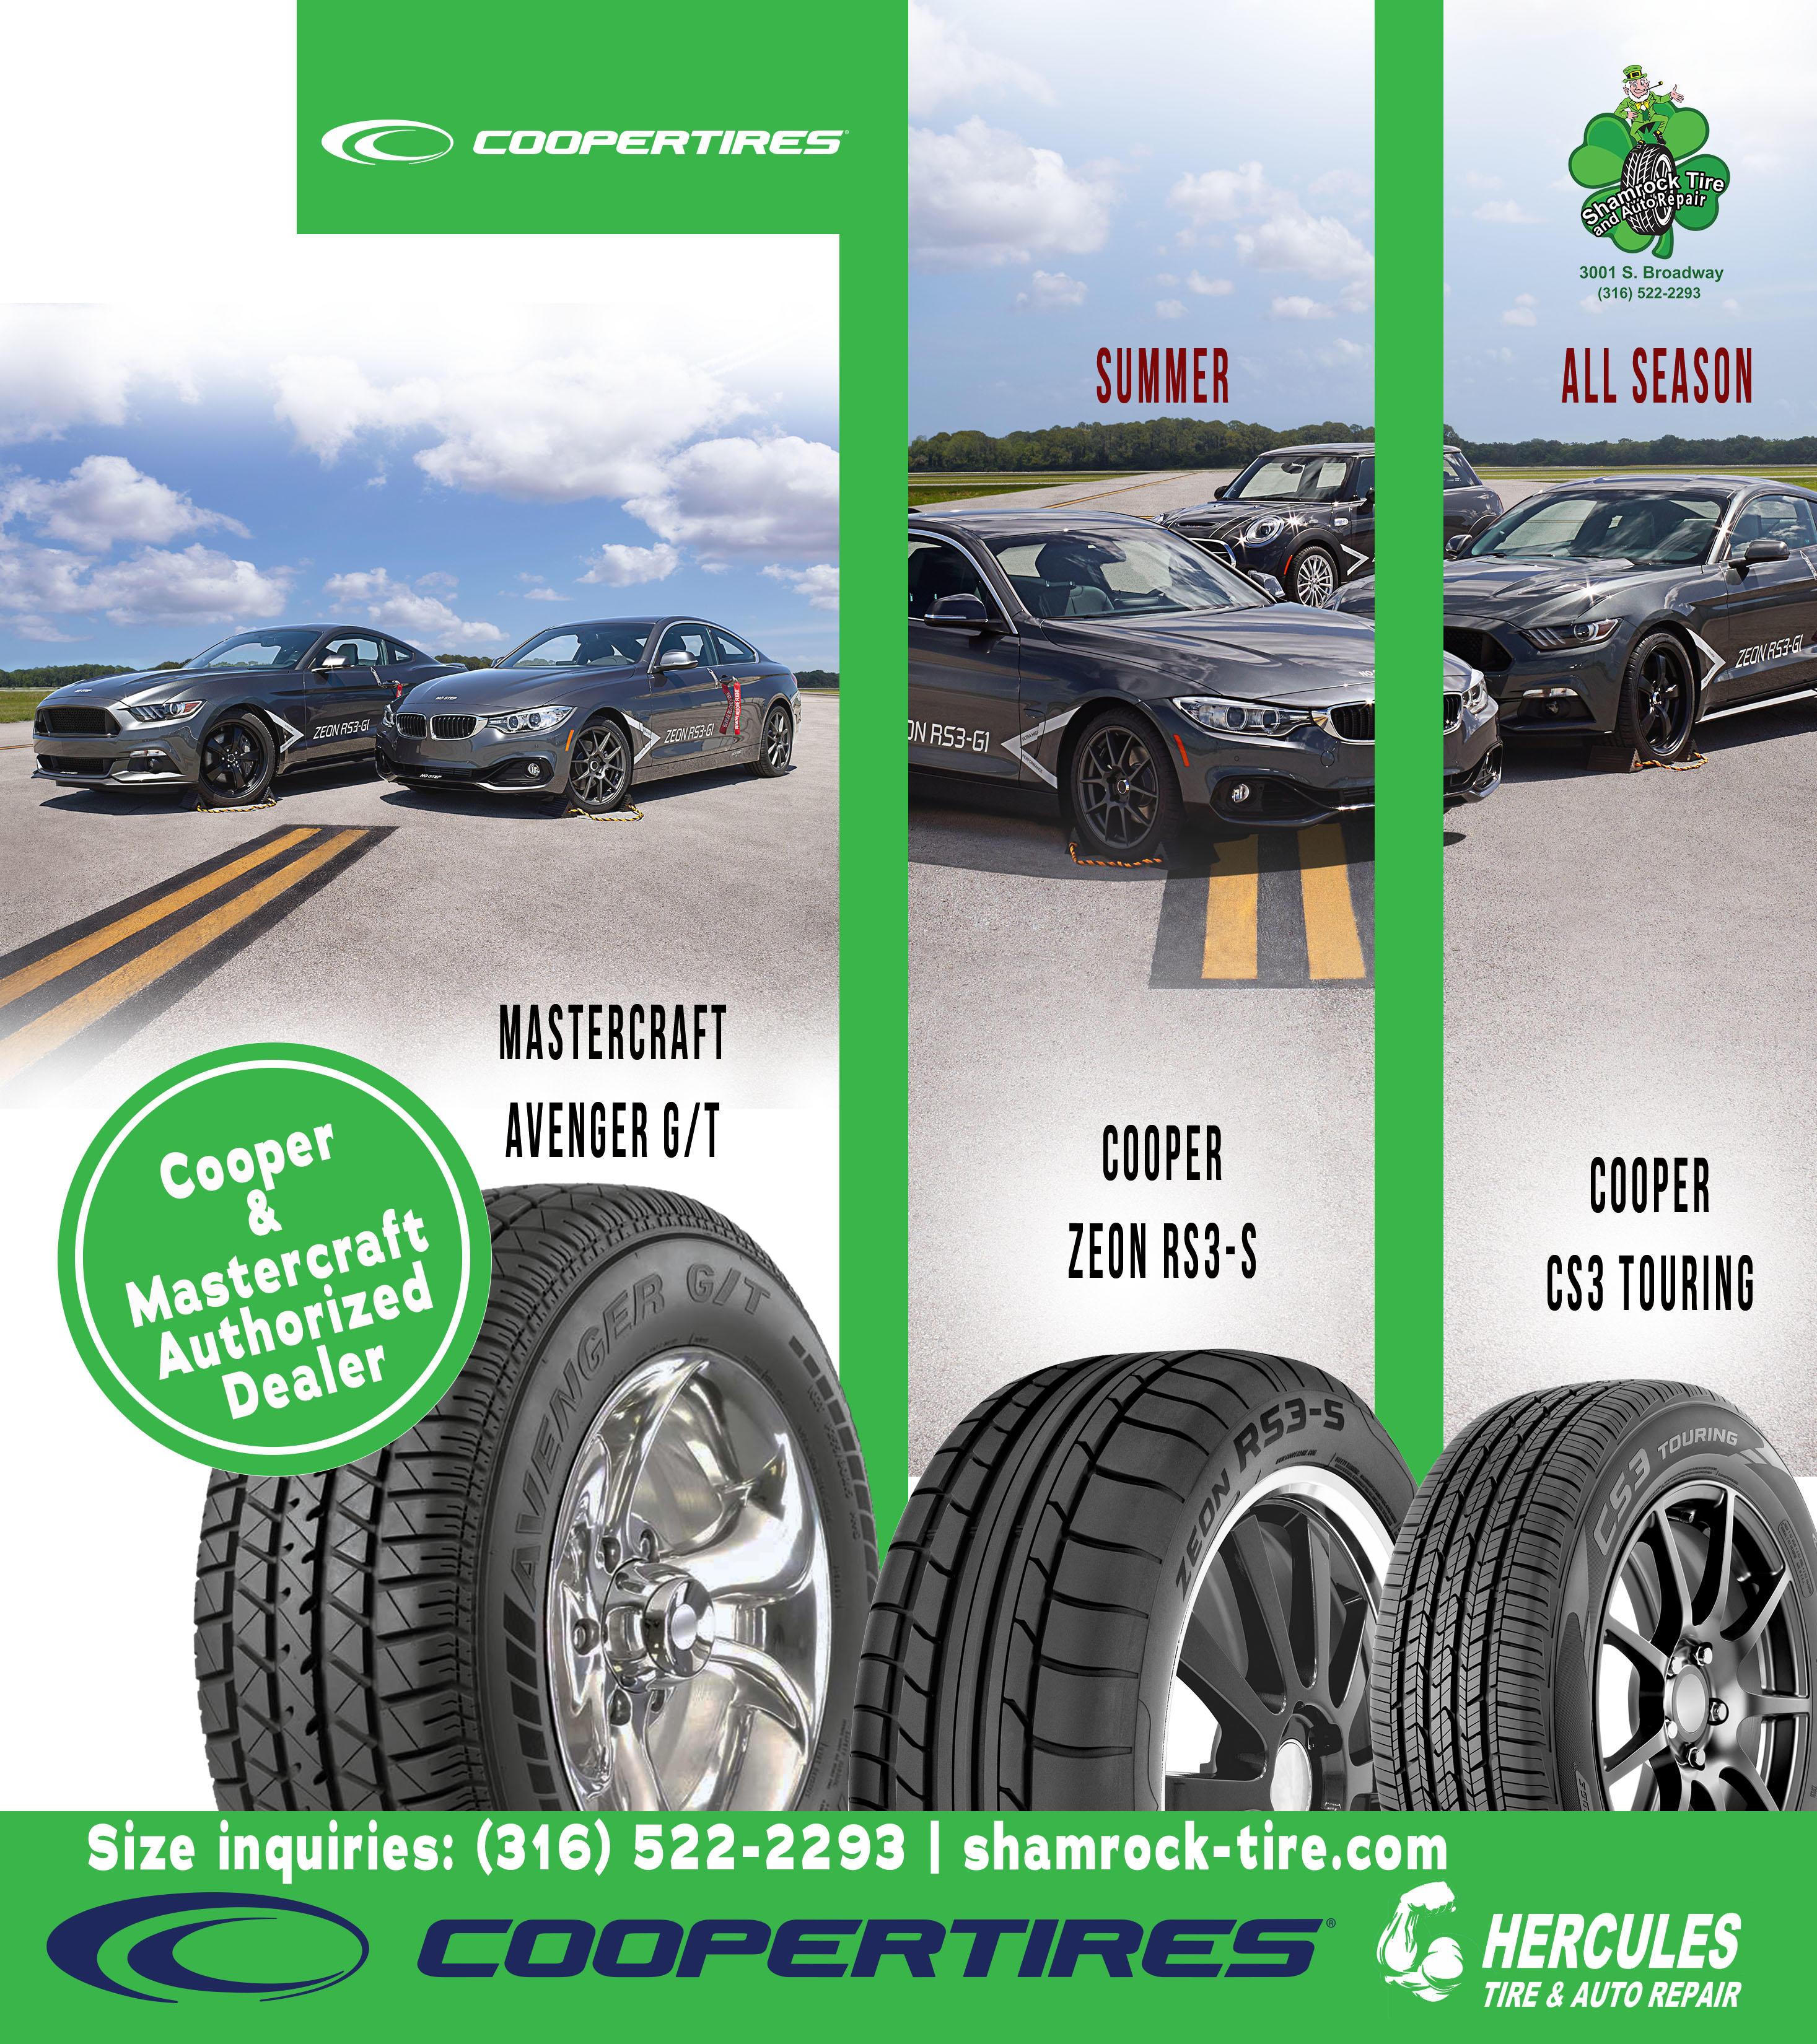 Shamrock Tire & Auto Repair